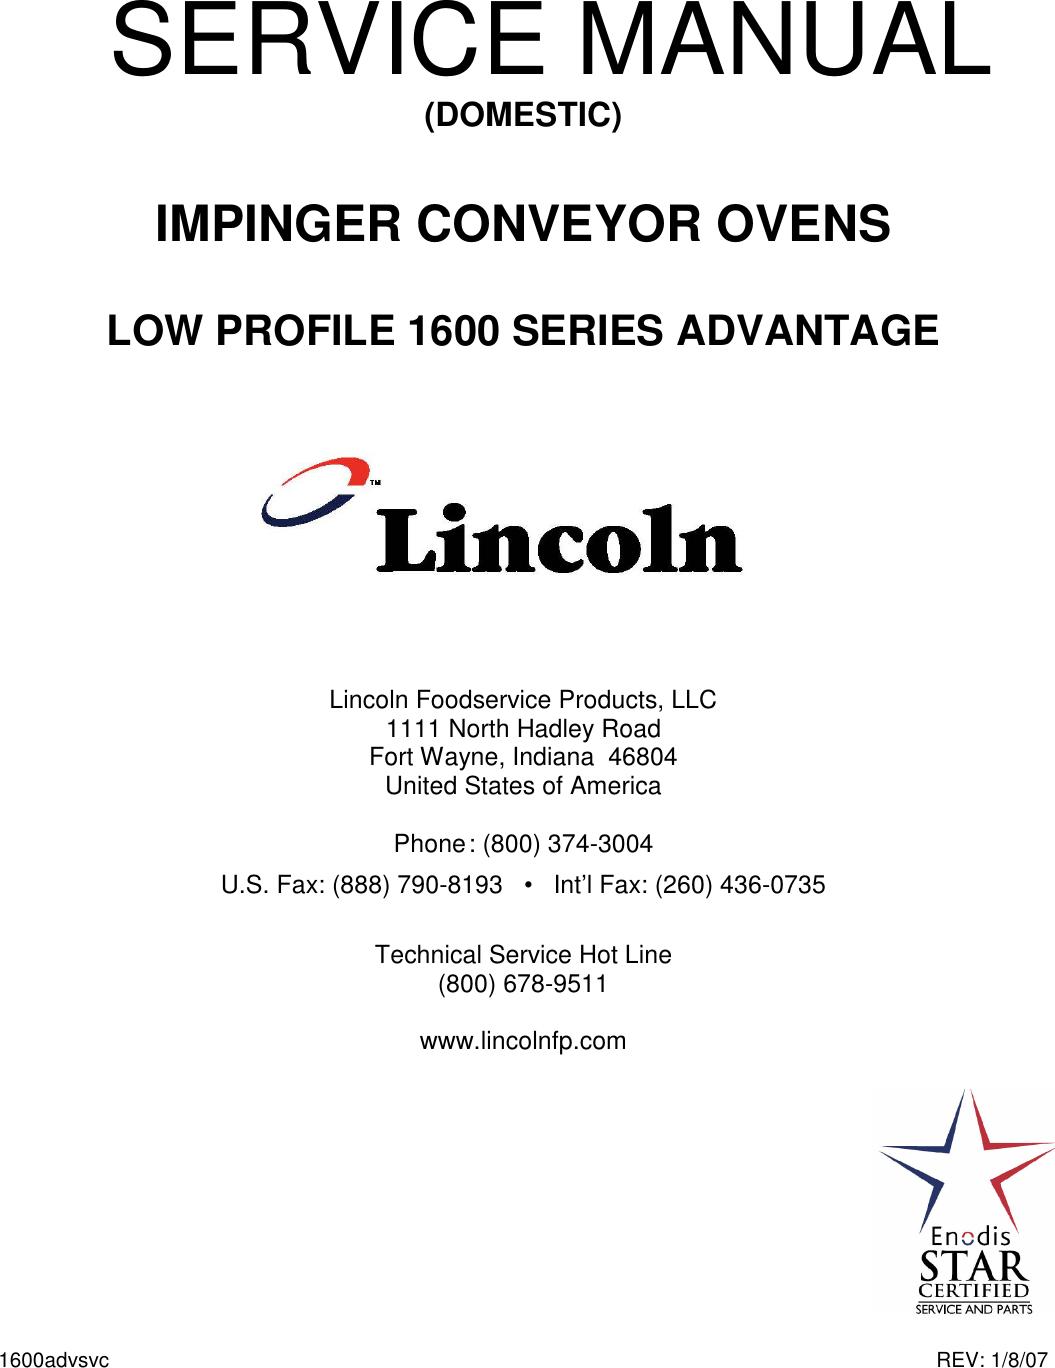 Lincoln Impinger Conveyor Ovens 1600 Users Manual Low Profile 000 A Sa 200 Service Advantage Series Domestic